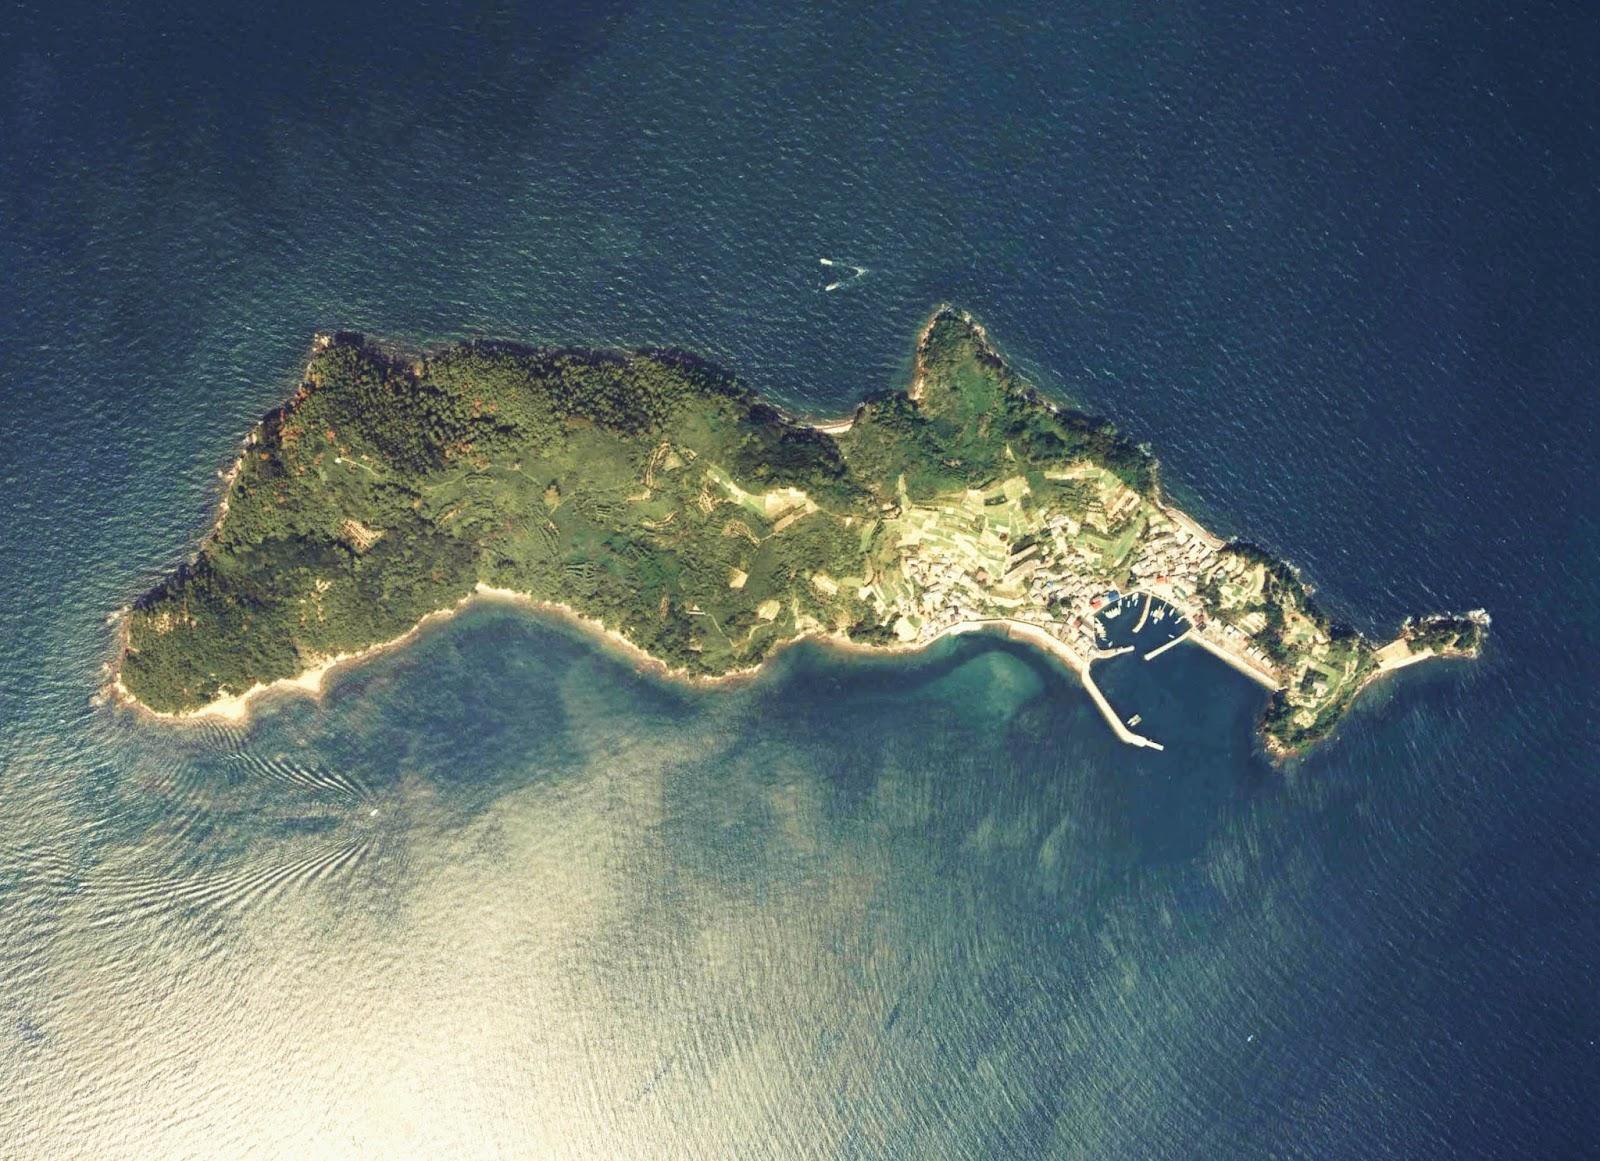 https://3.bp.blogspot.com/-MJkRNfjq9F8/WceaKOi3lPI/AAAAAAABihY/7QxIeqjub-YF9kKaJxUkDlVB-HaiKz1YQCLcBGAs/s1600/Iyo-Aoshima_Island_Aerial_photograph.jpg